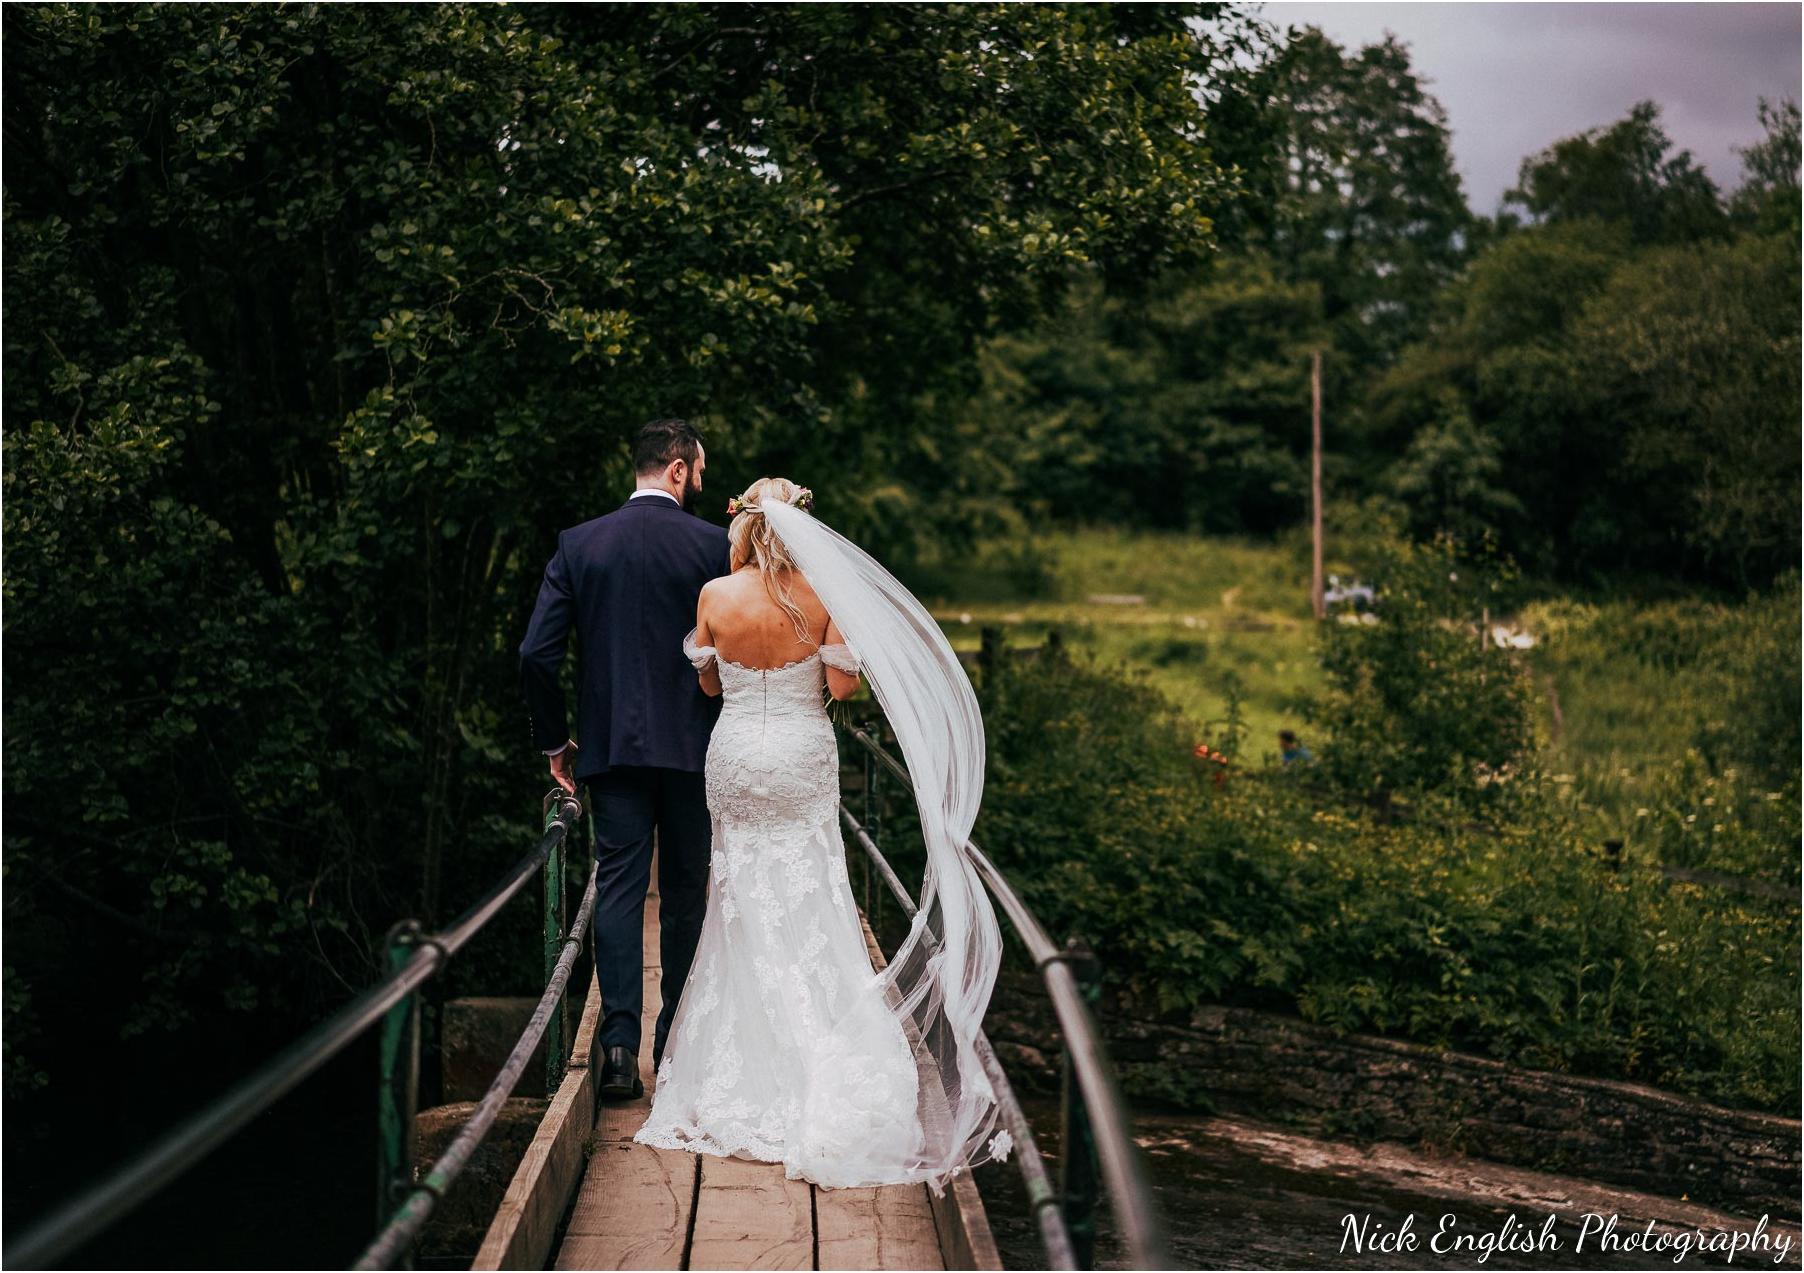 Whitebottom_Farm_Wedding_Manchester_Photograph-44.jpg